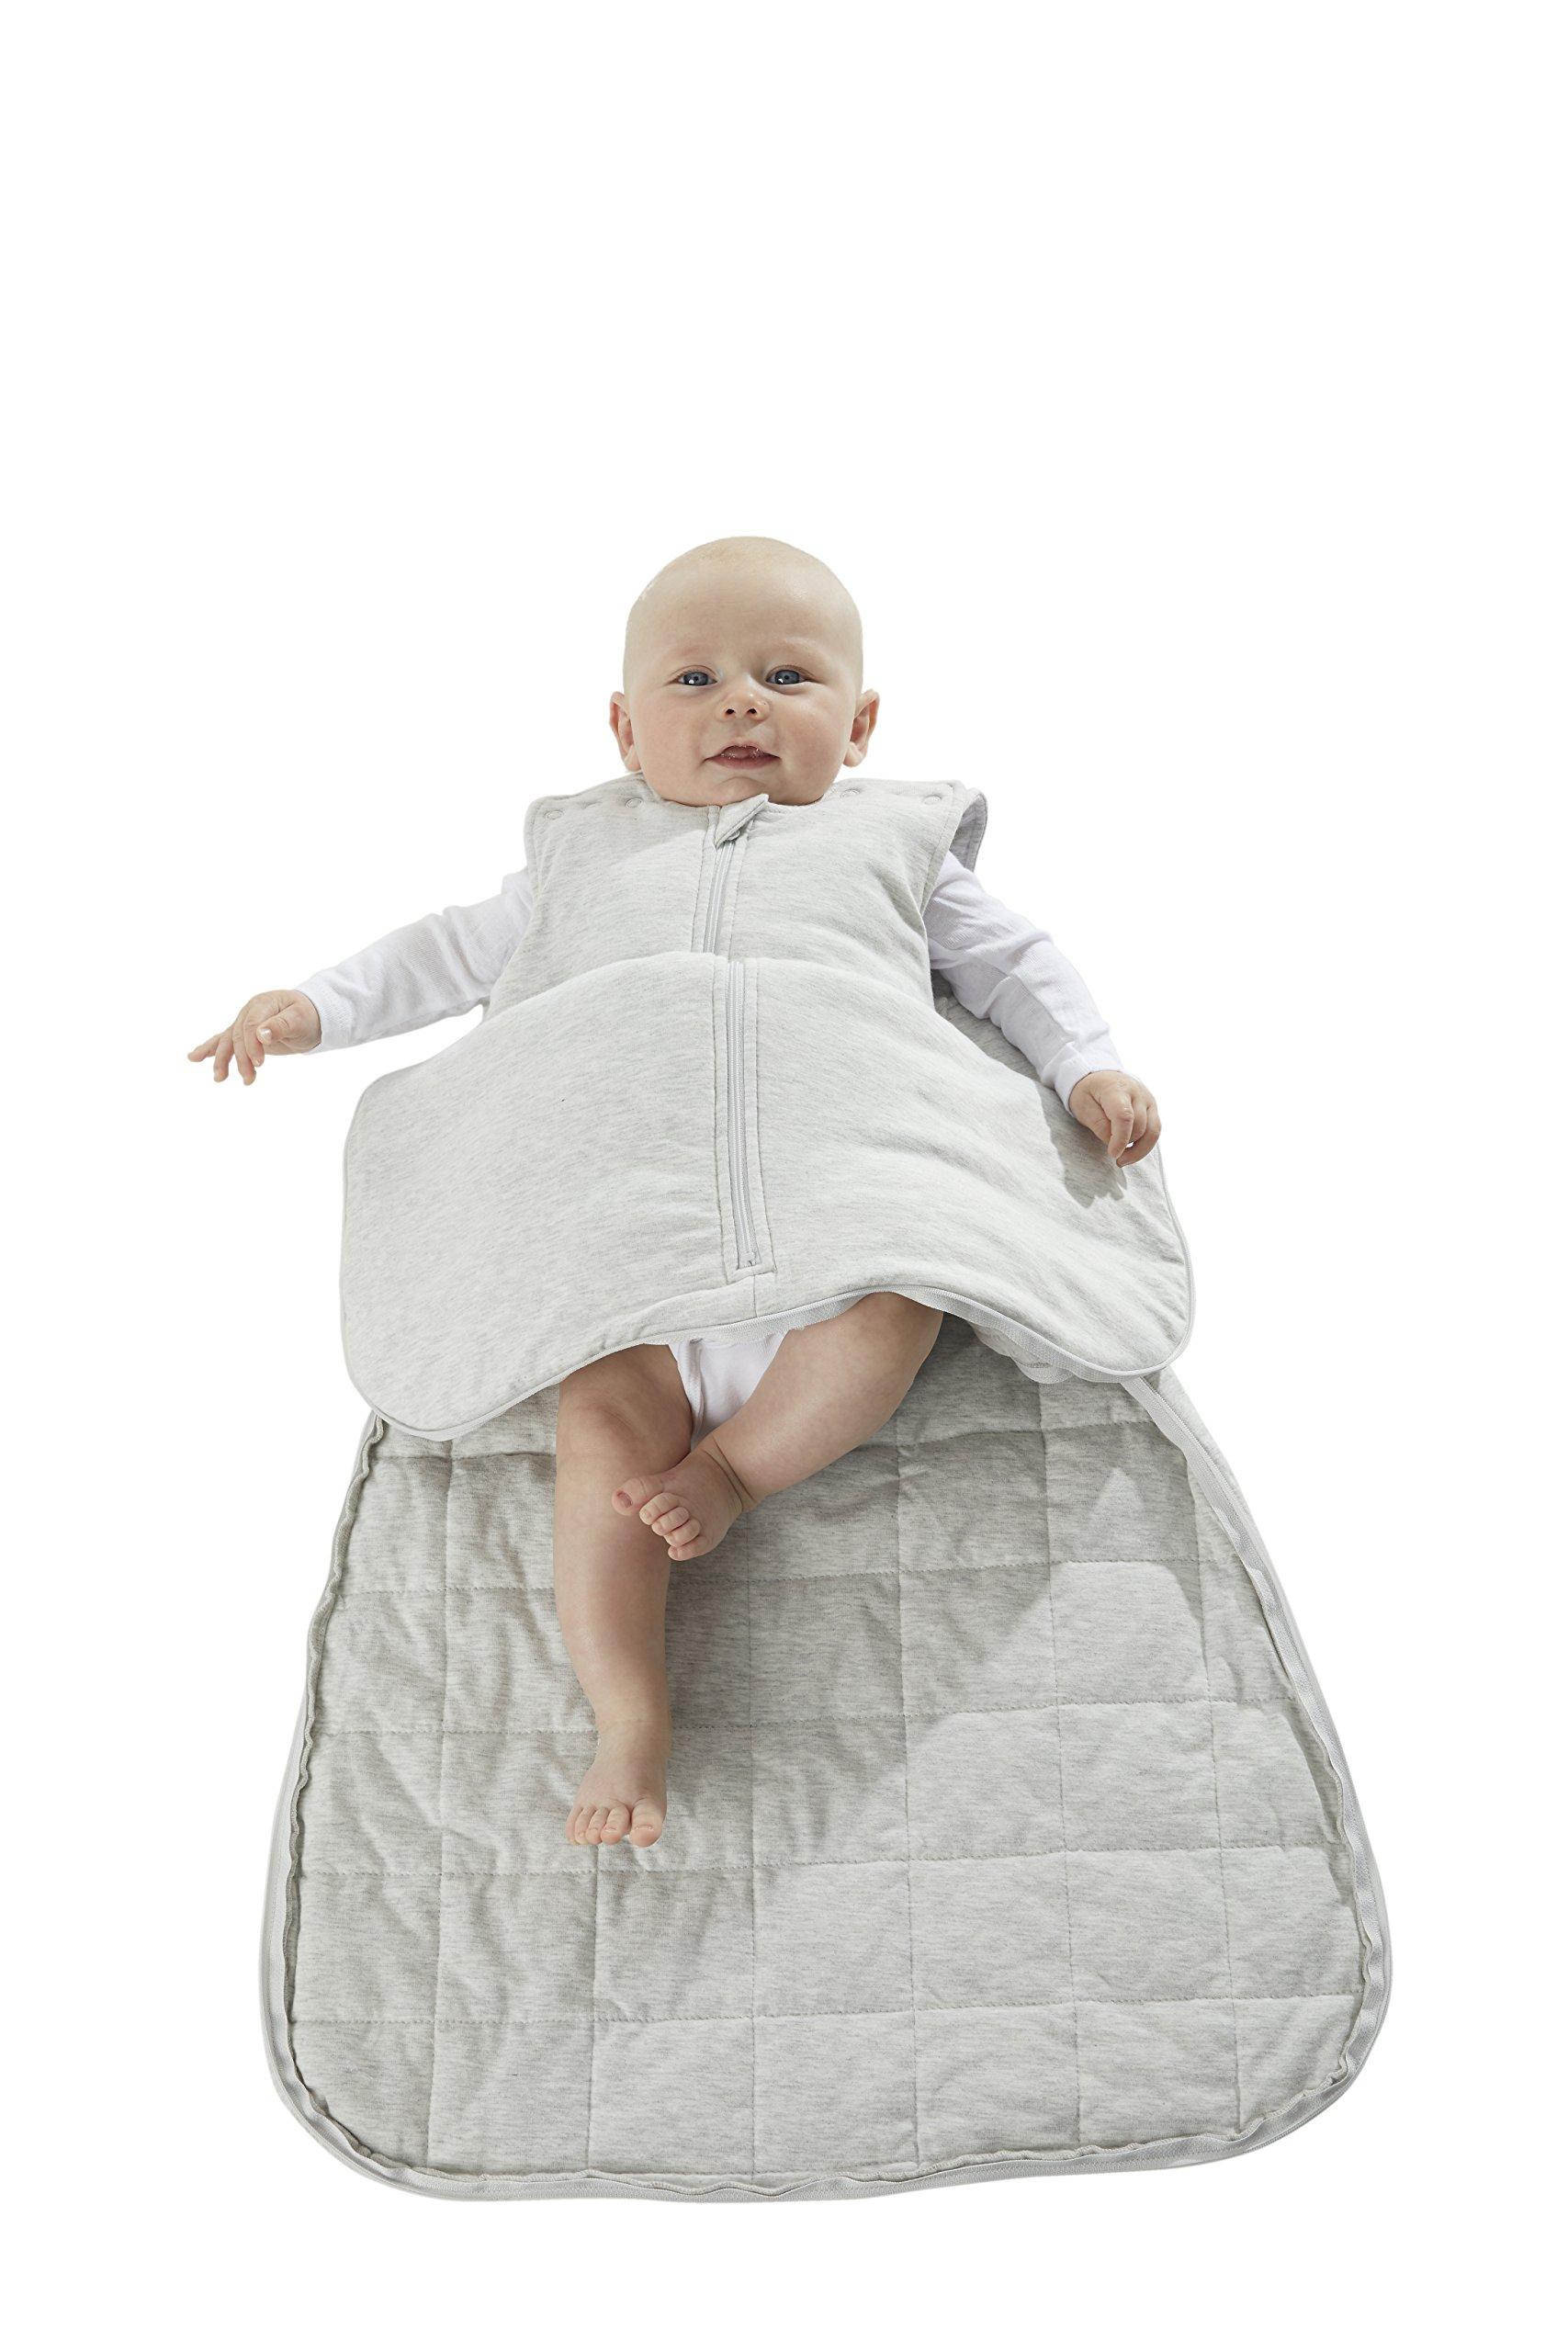 Gunapod Sleep Sack Luxury BambooViscose Boy Girl Wearable Blanket Baby Sleeping Bag 0-9 Months, Heather Grey by Gunamuna